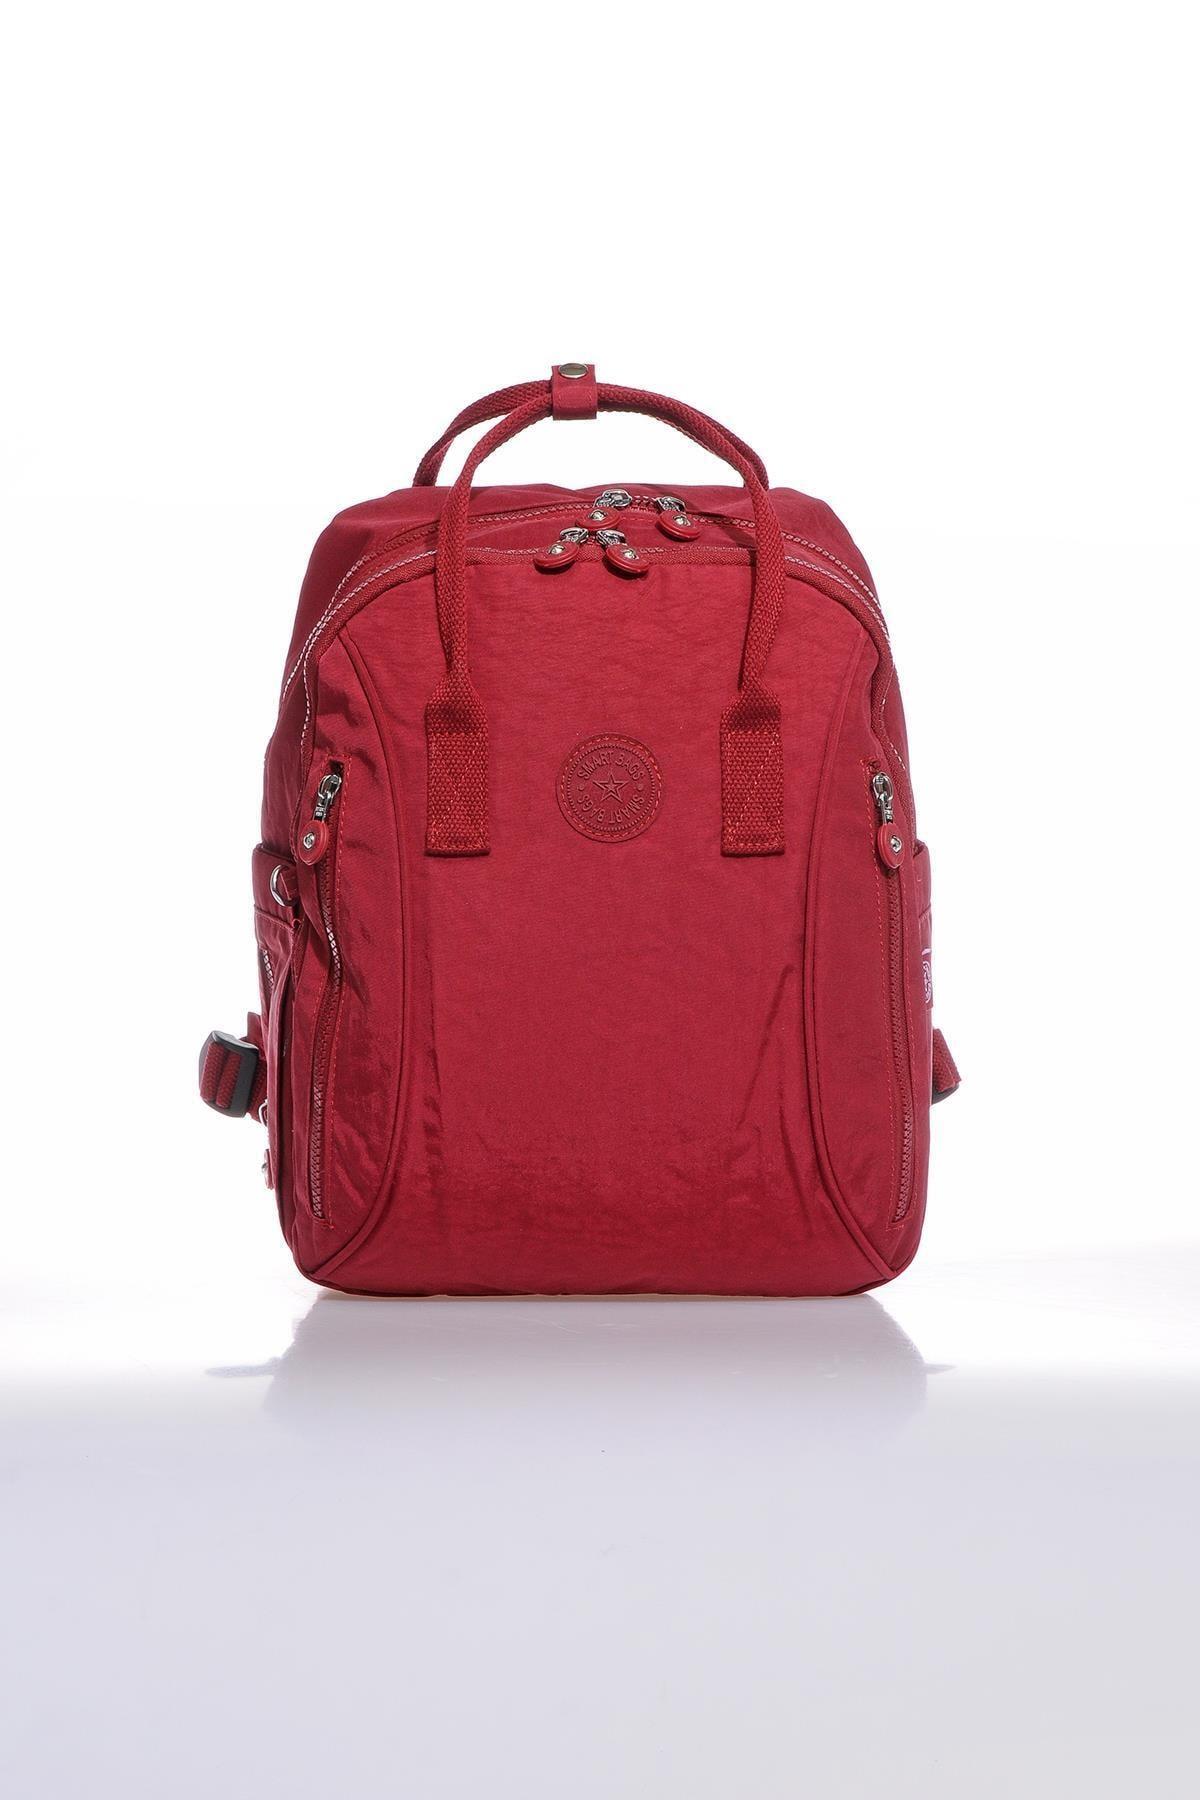 SMART BAGS Smb1220-0021 Bordo Kadın Sırt Çantası 1